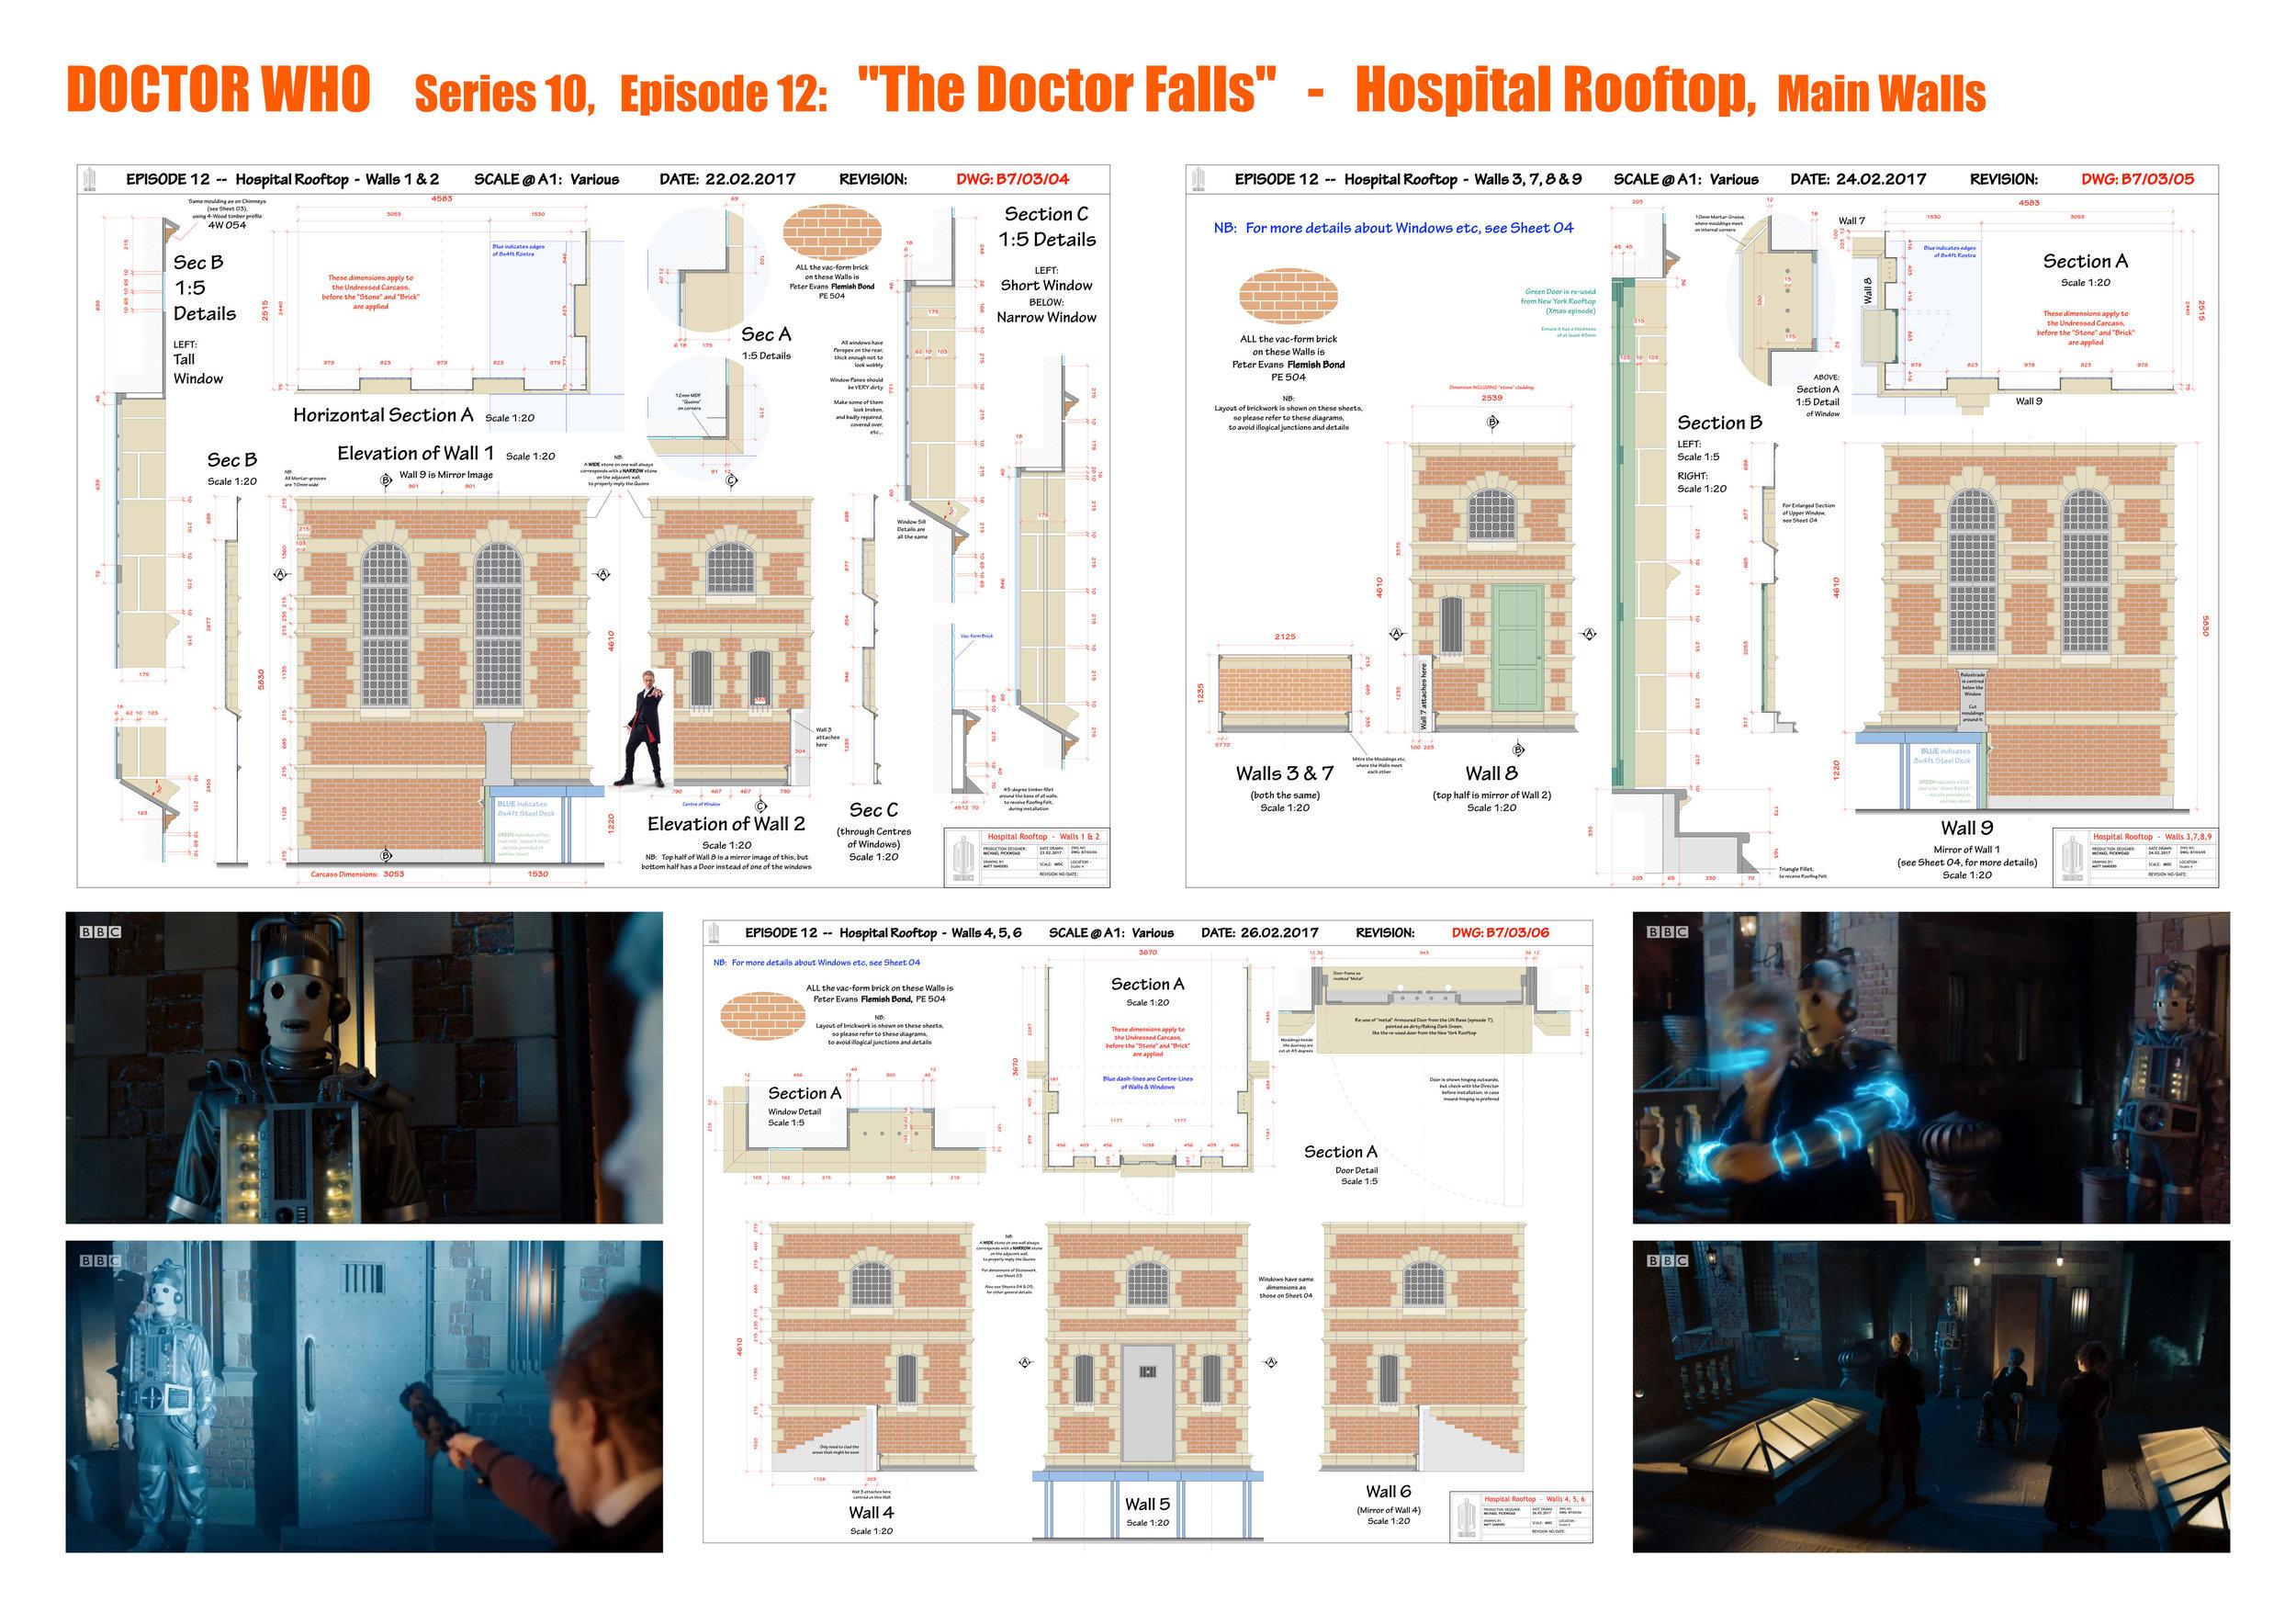 Ep 12 - The Doctor Falls - Hospital Walls.jpg